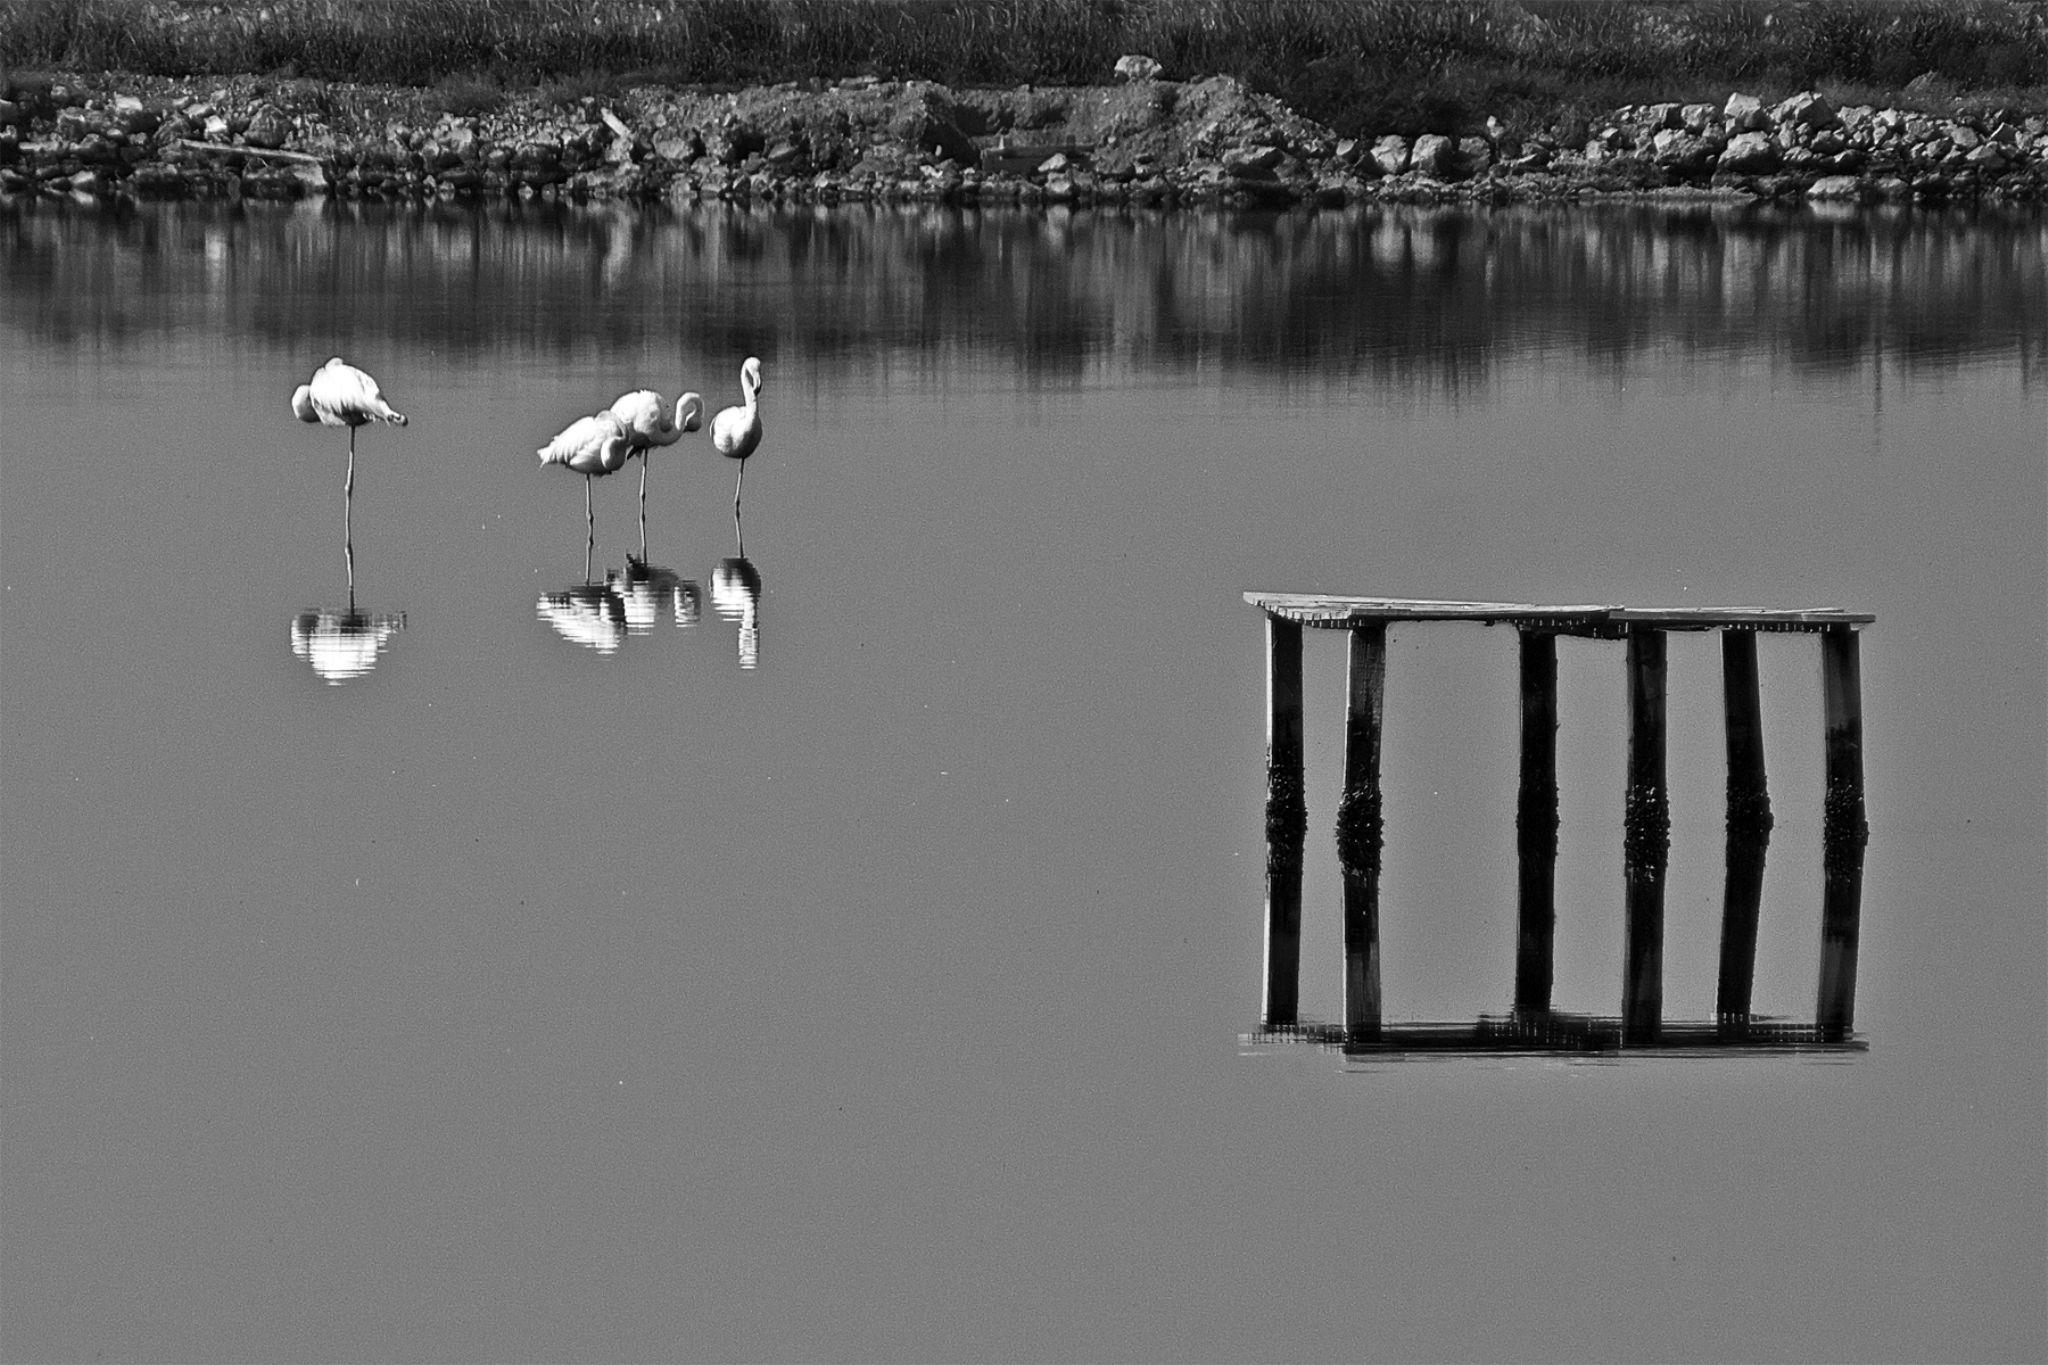 Dört Flamingo ( Four Flamingos ) by Suleyman Bilgen